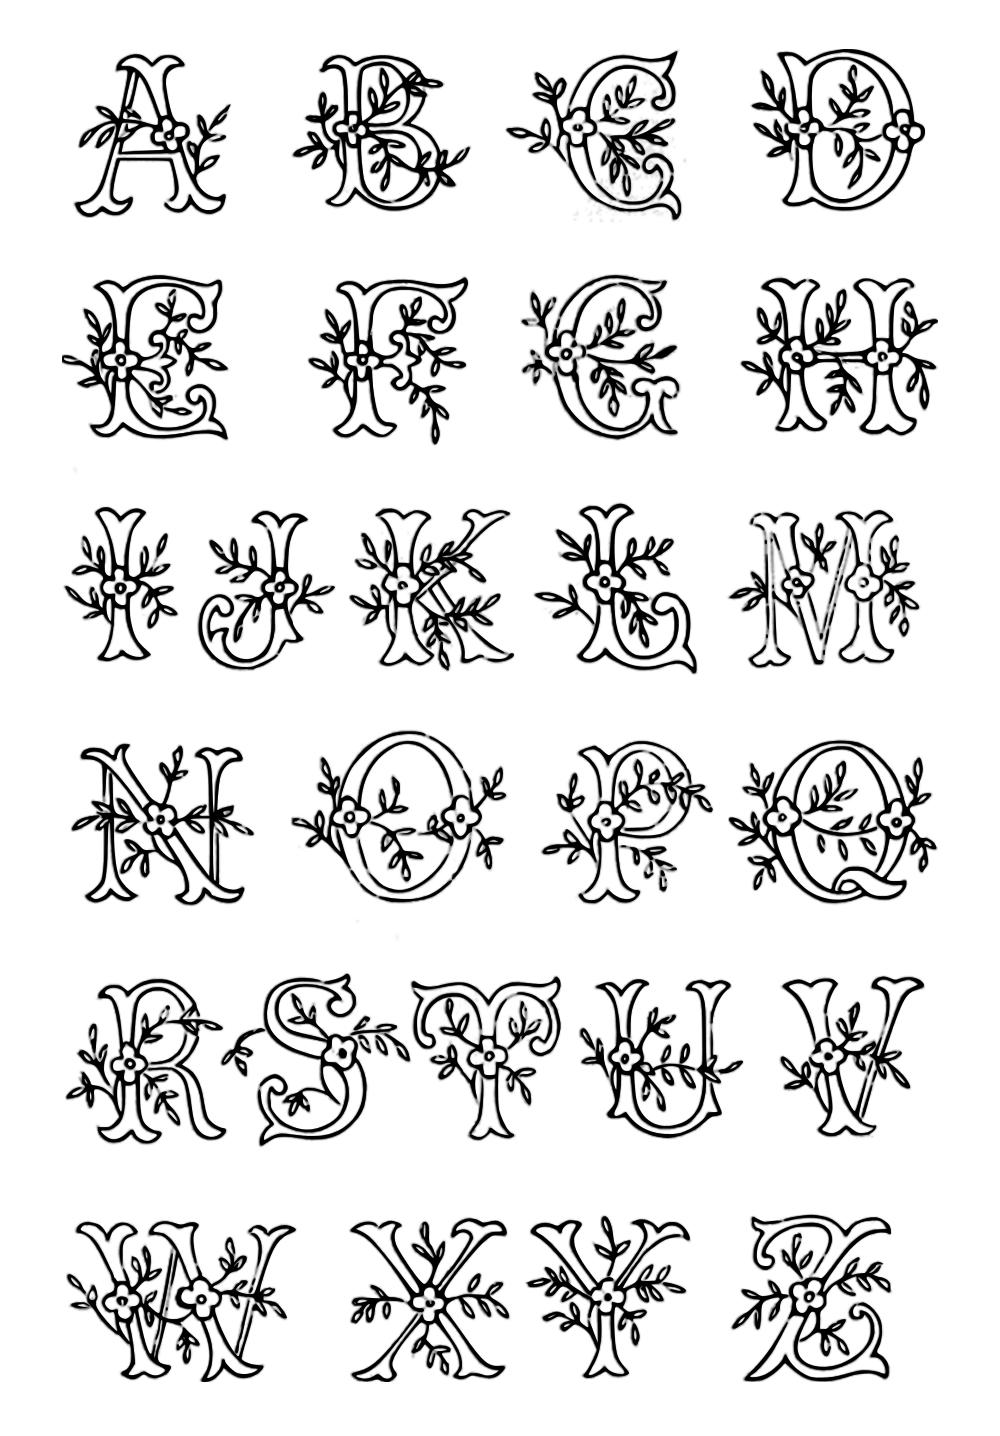 Letras | bordado | Letras, Bordado y Bordar letras